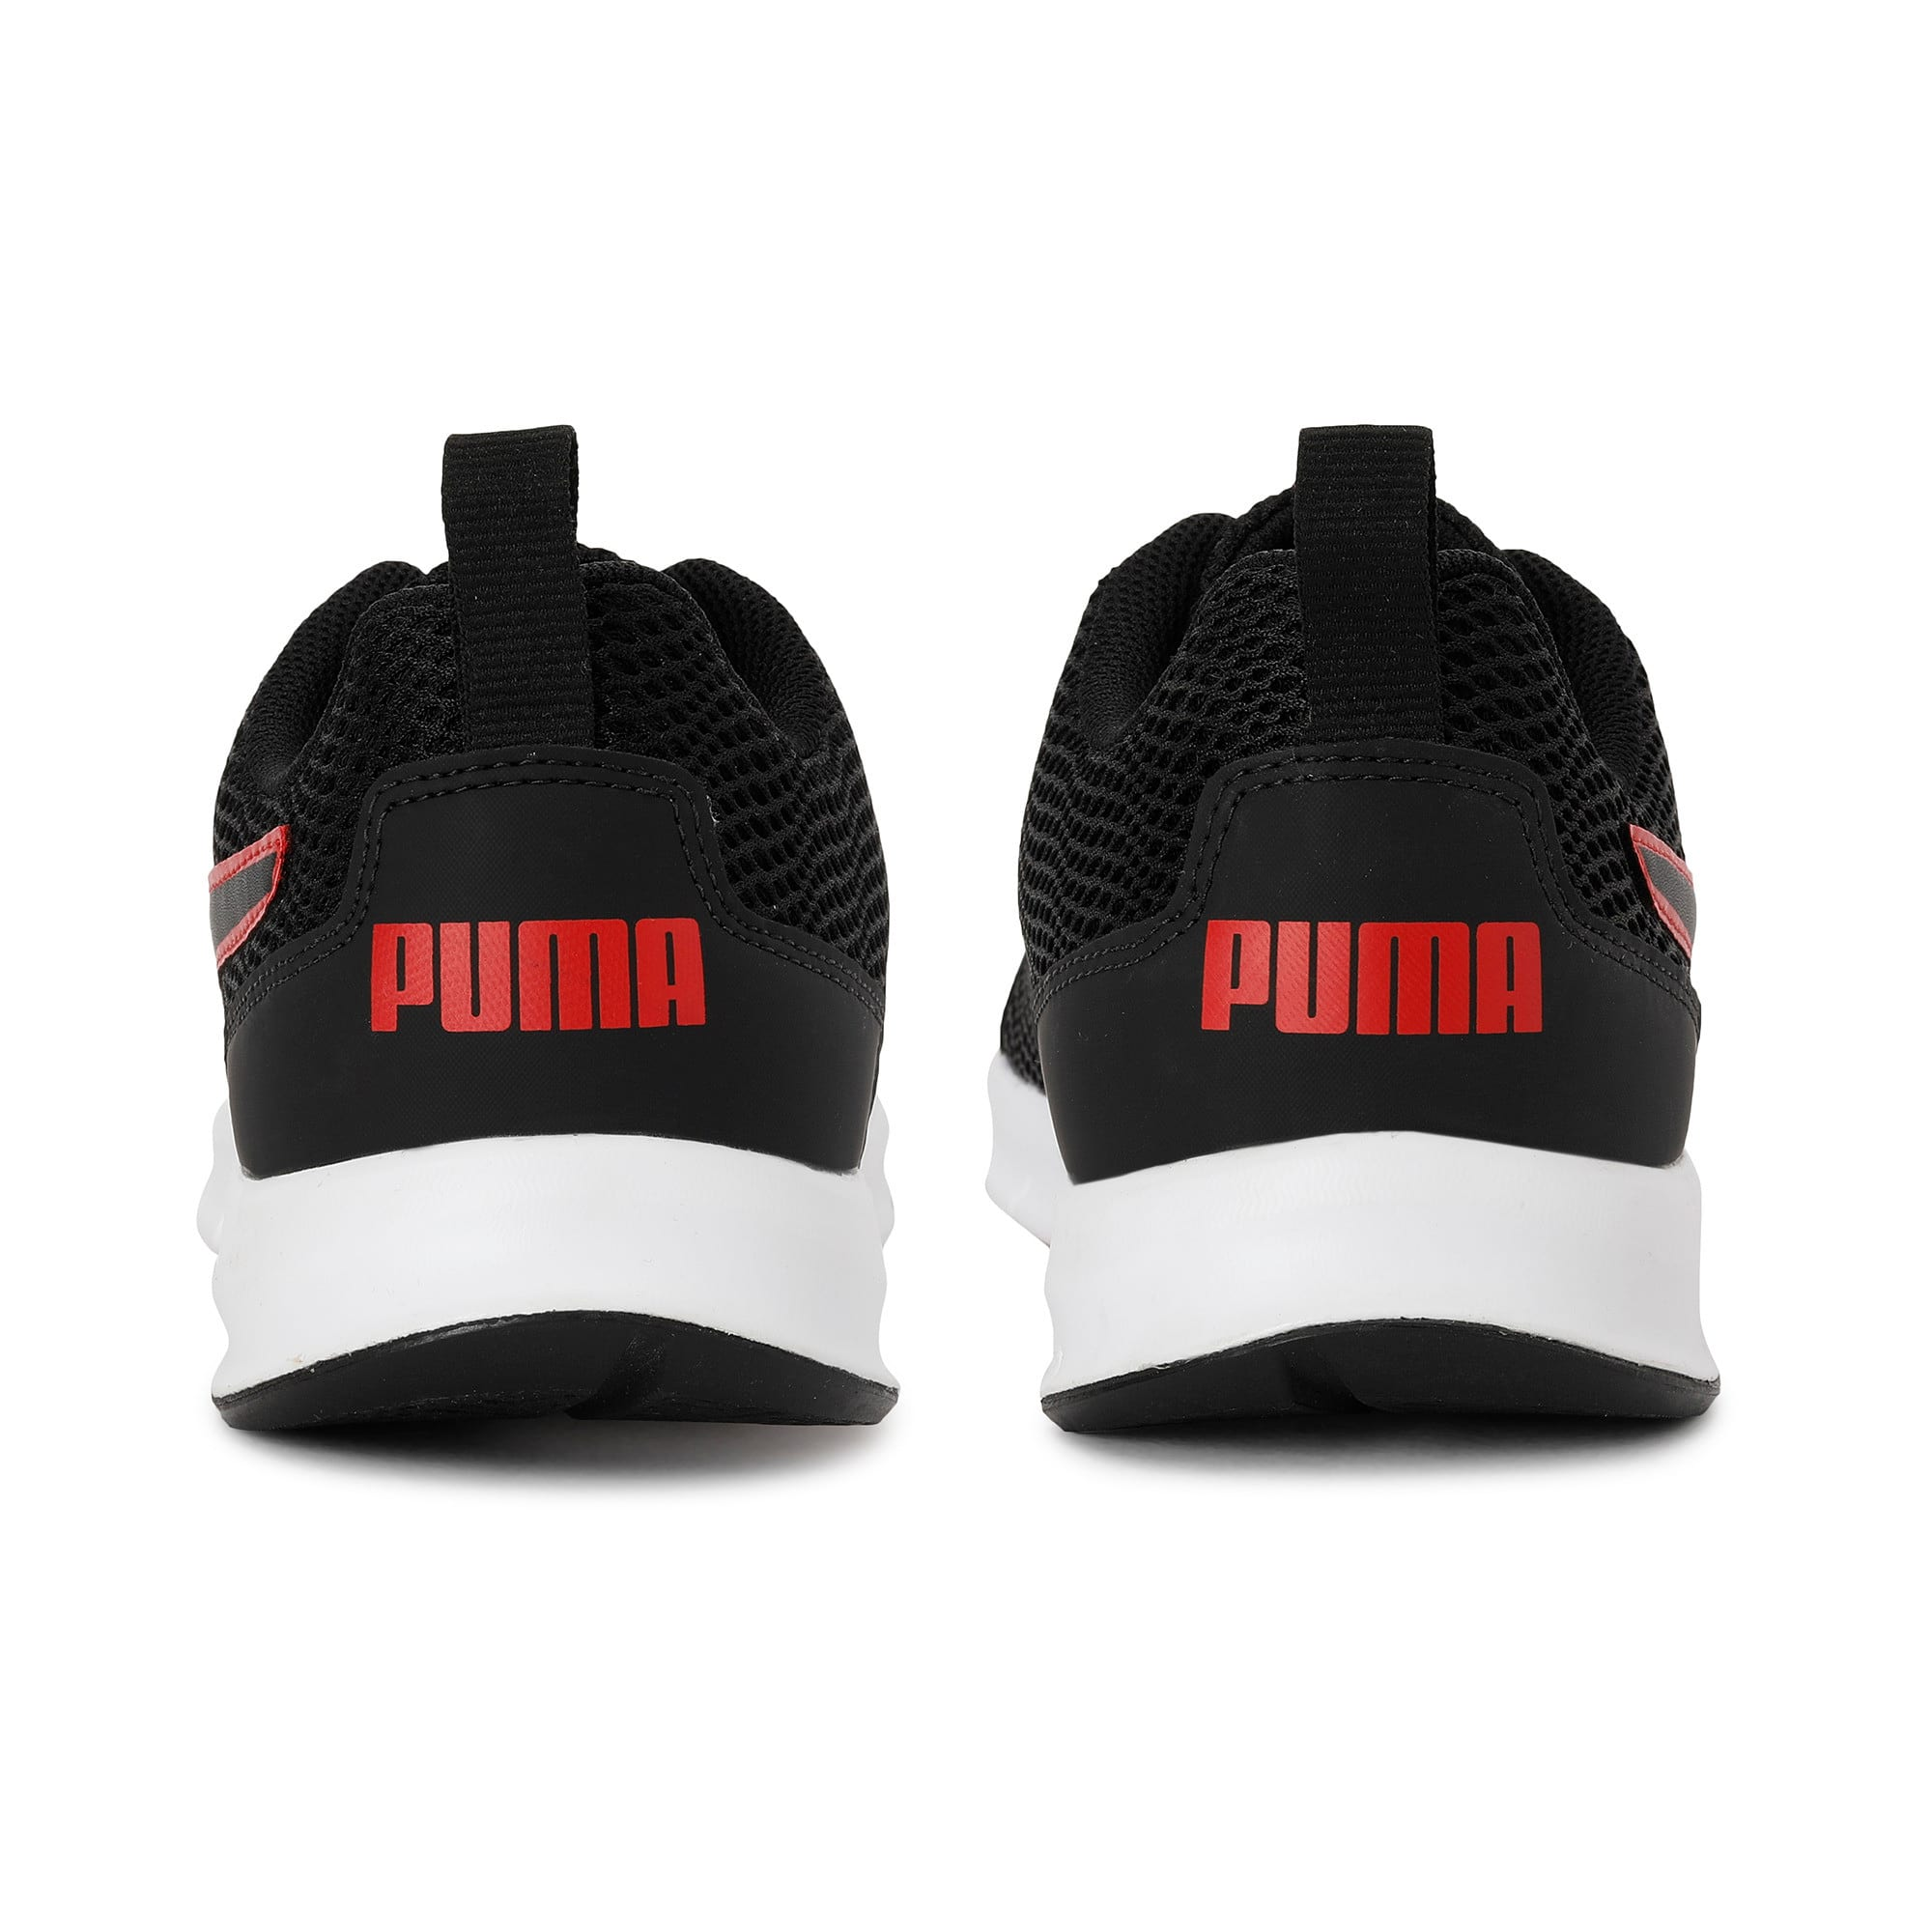 Thumbnail 3 of Rapid Runner IDP Puma Black-High Risk Re, Puma Black-High Risk Red, medium-IND